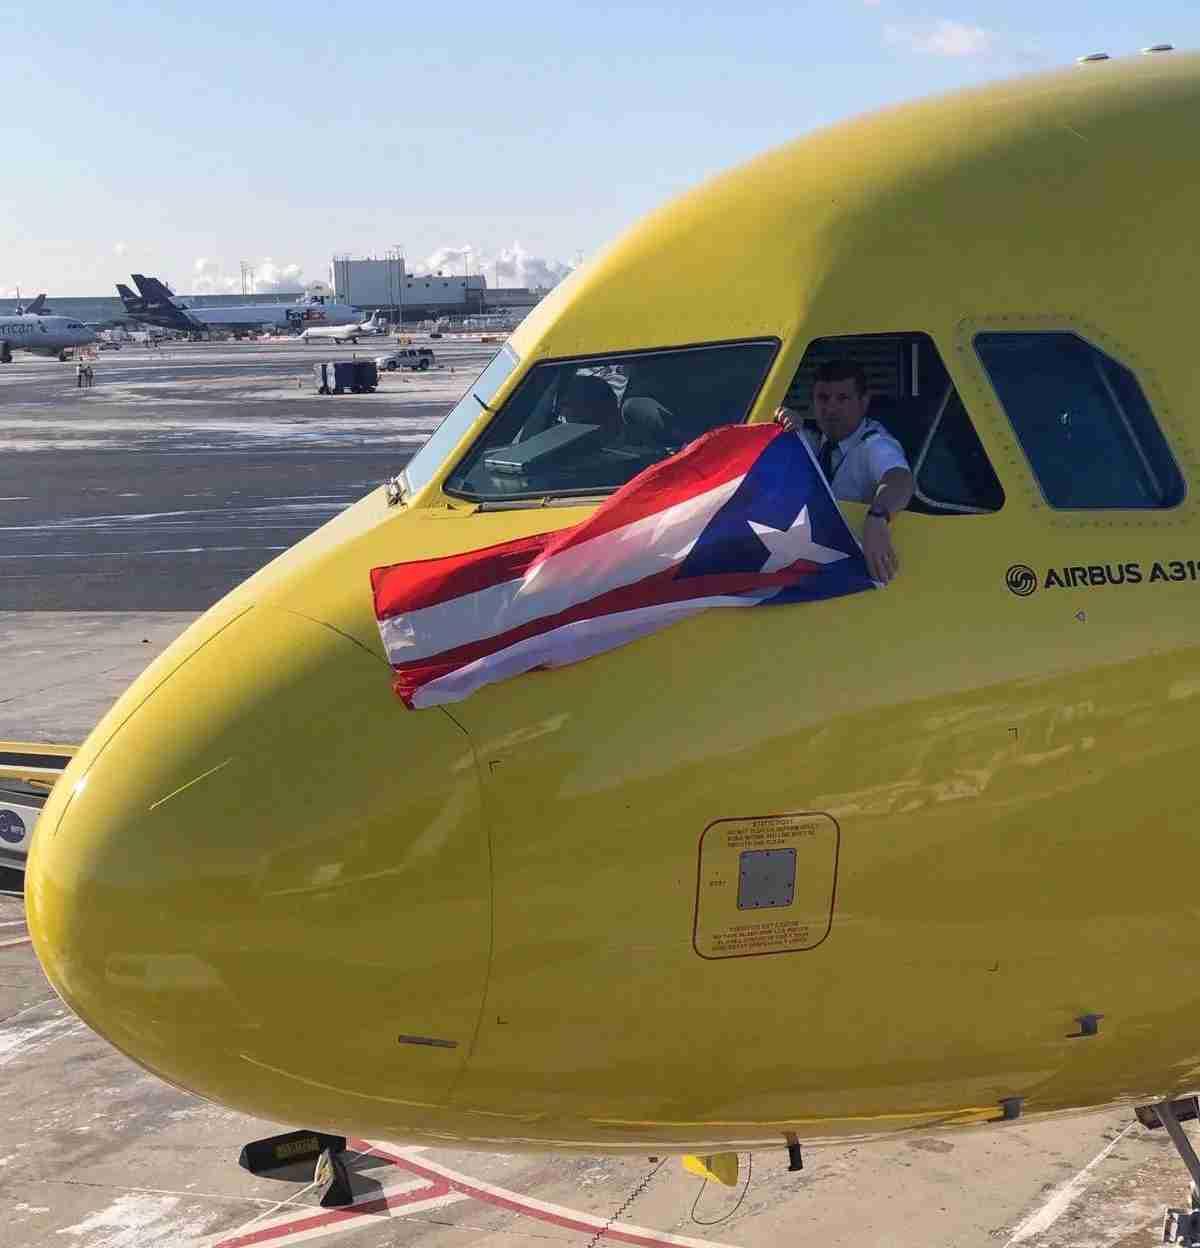 A Spirit Airlines jet at San Juan